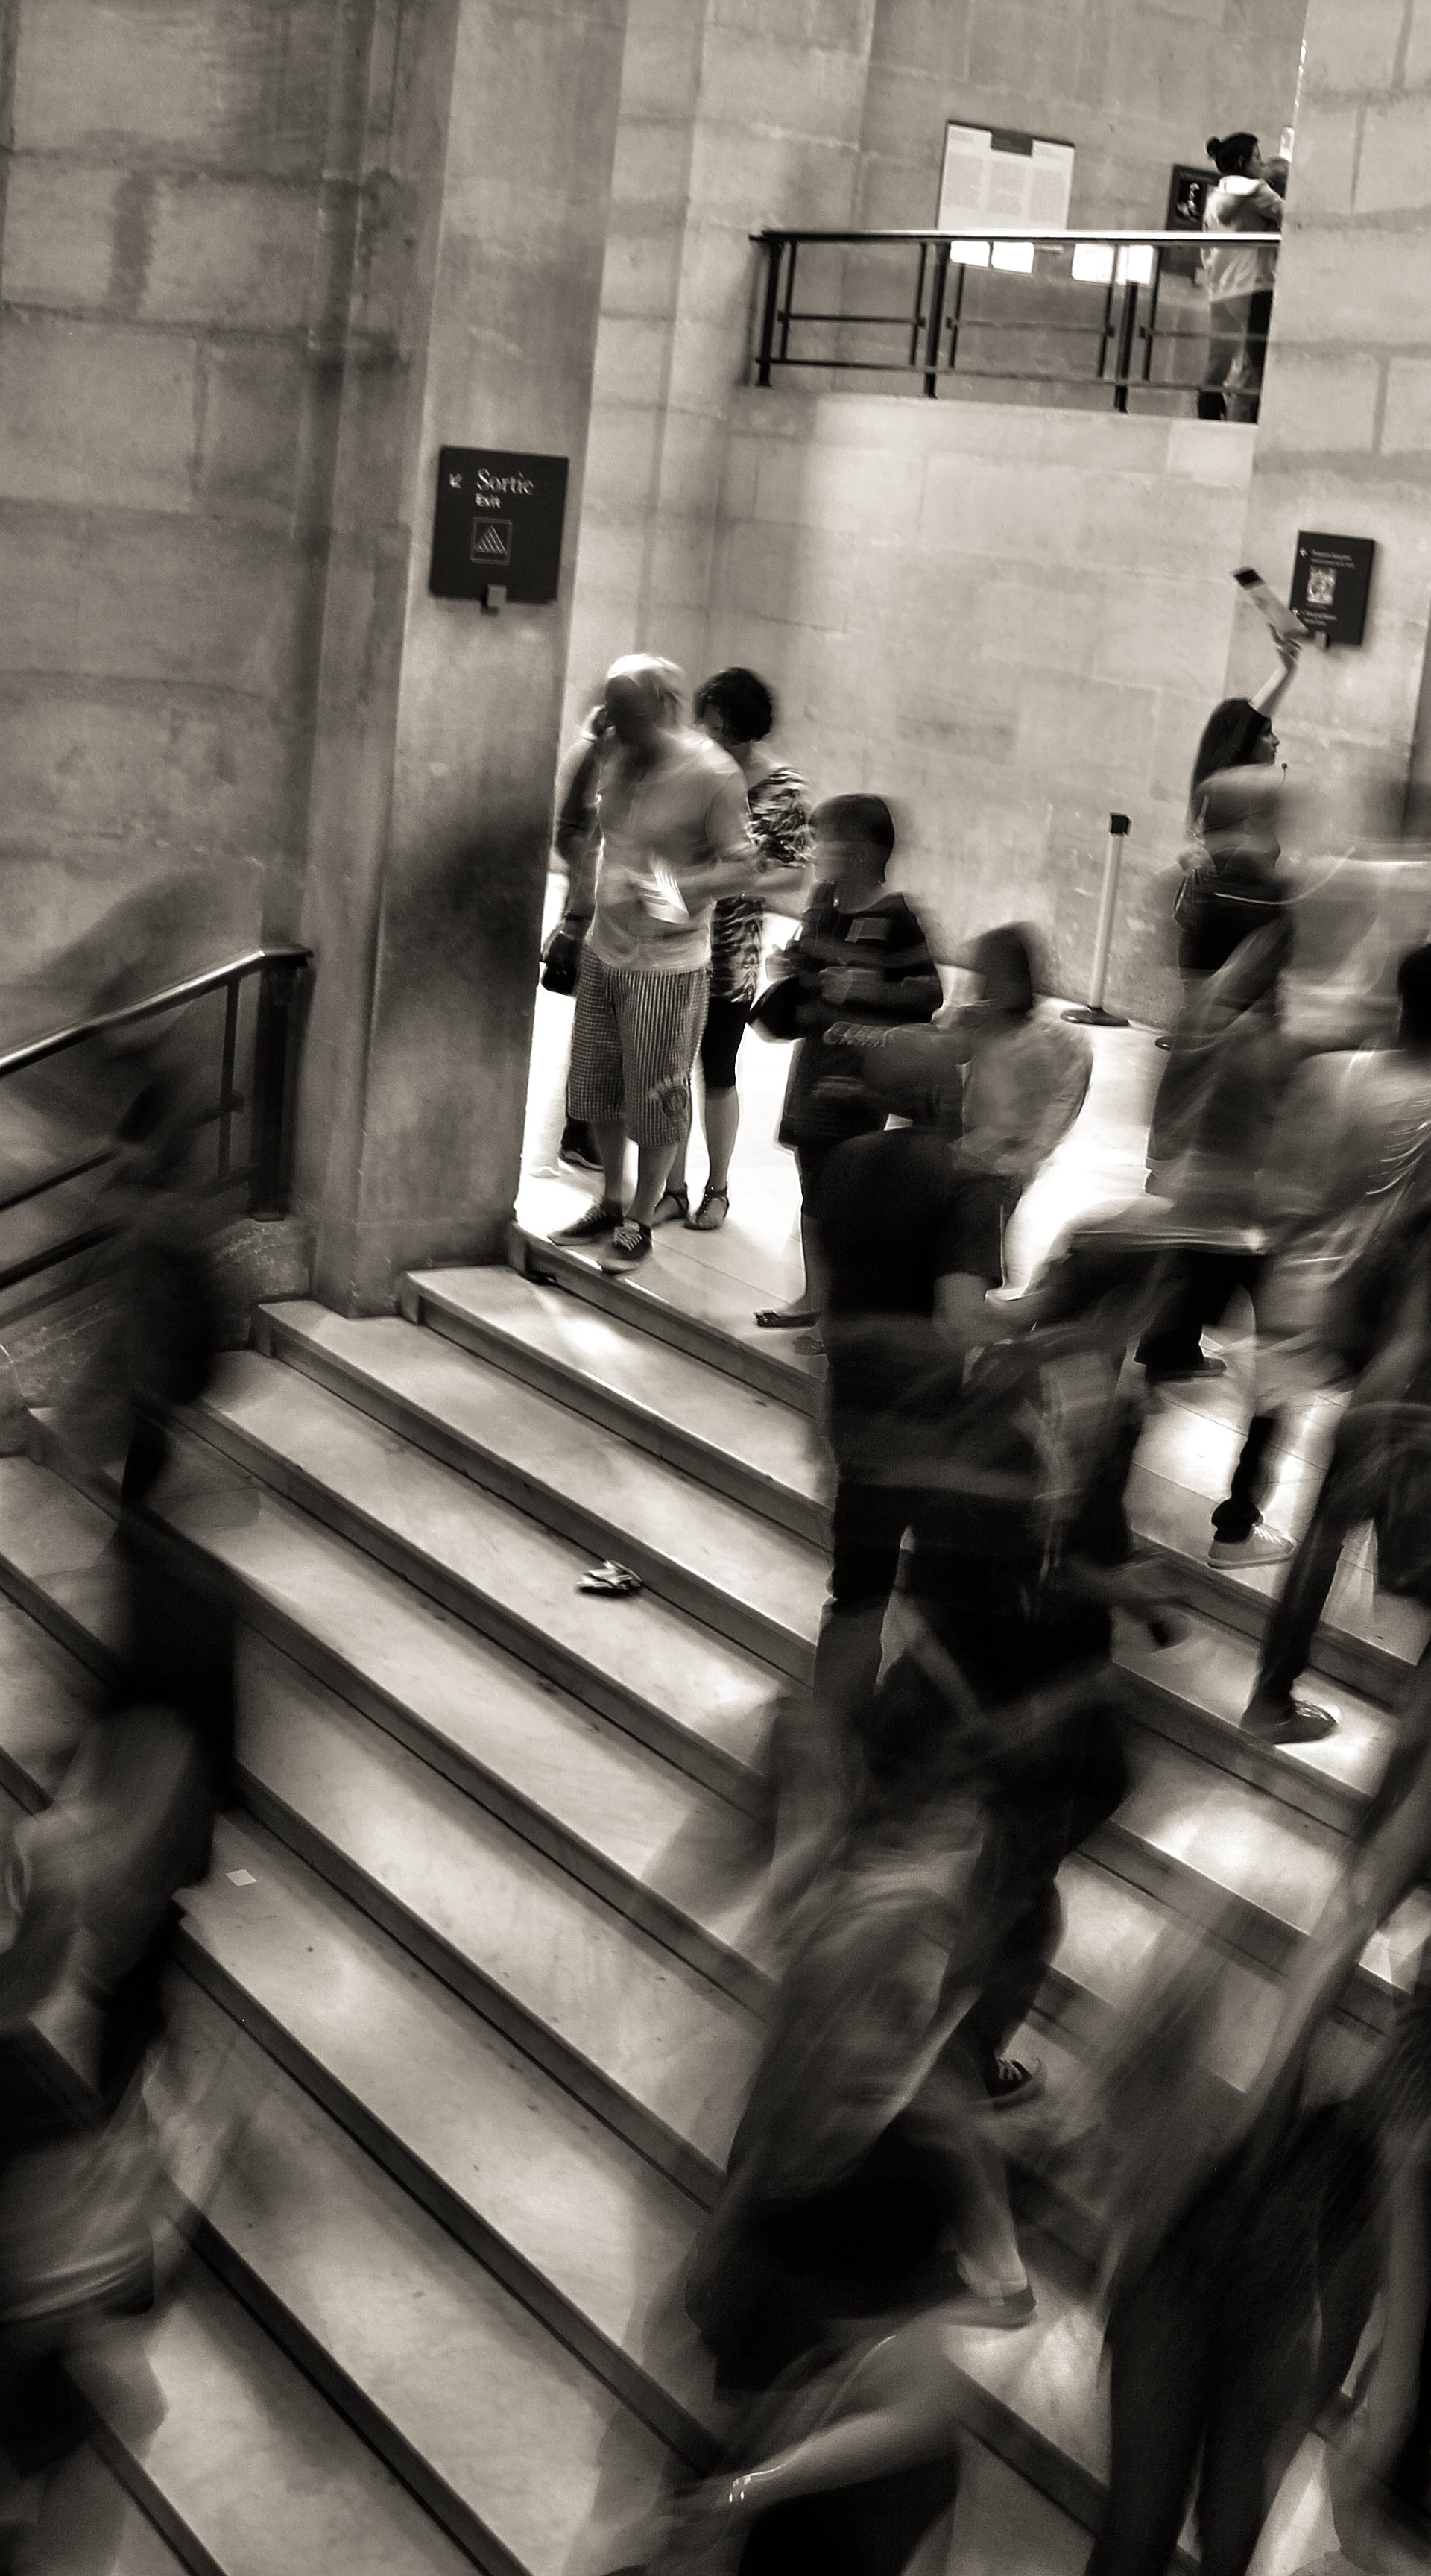 Photo by José Martín Ramírez C on Unsplash